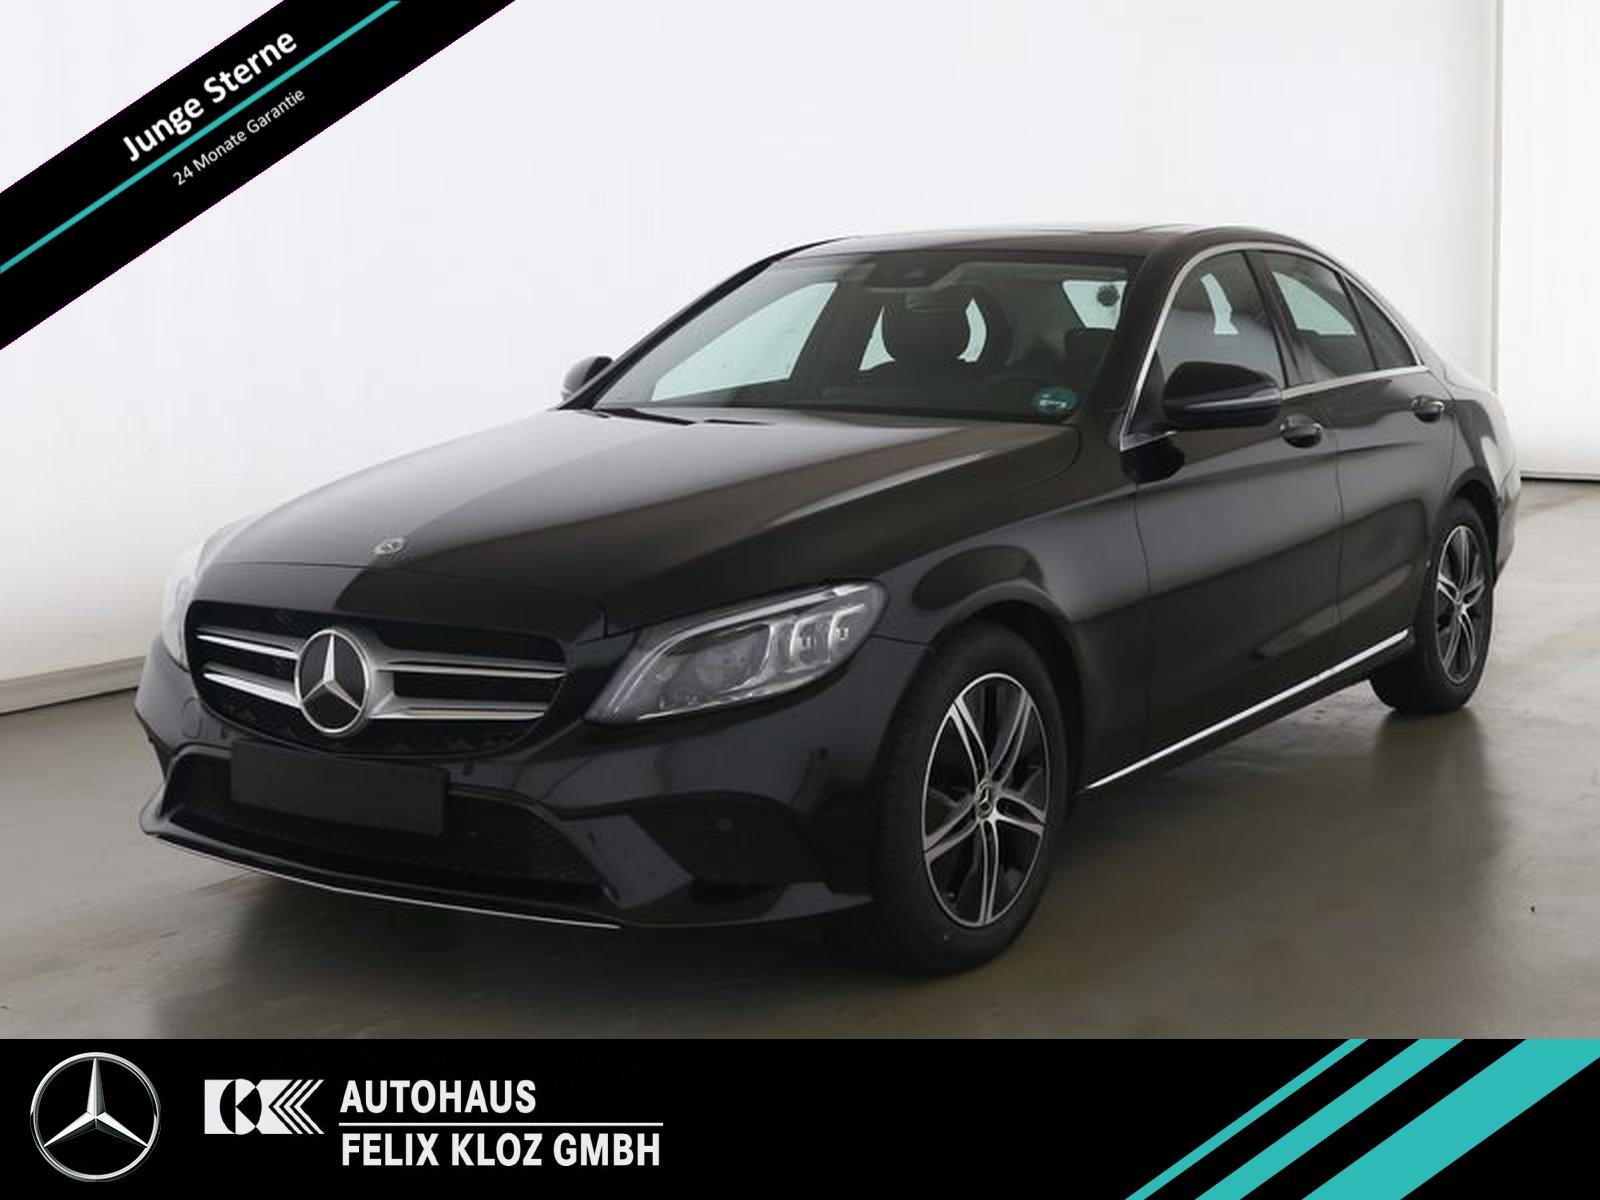 Mercedes-Benz C 200 Avantgarde*Navi*MultiBeam*Totwinkel*SHD, Jahr 2020, Benzin